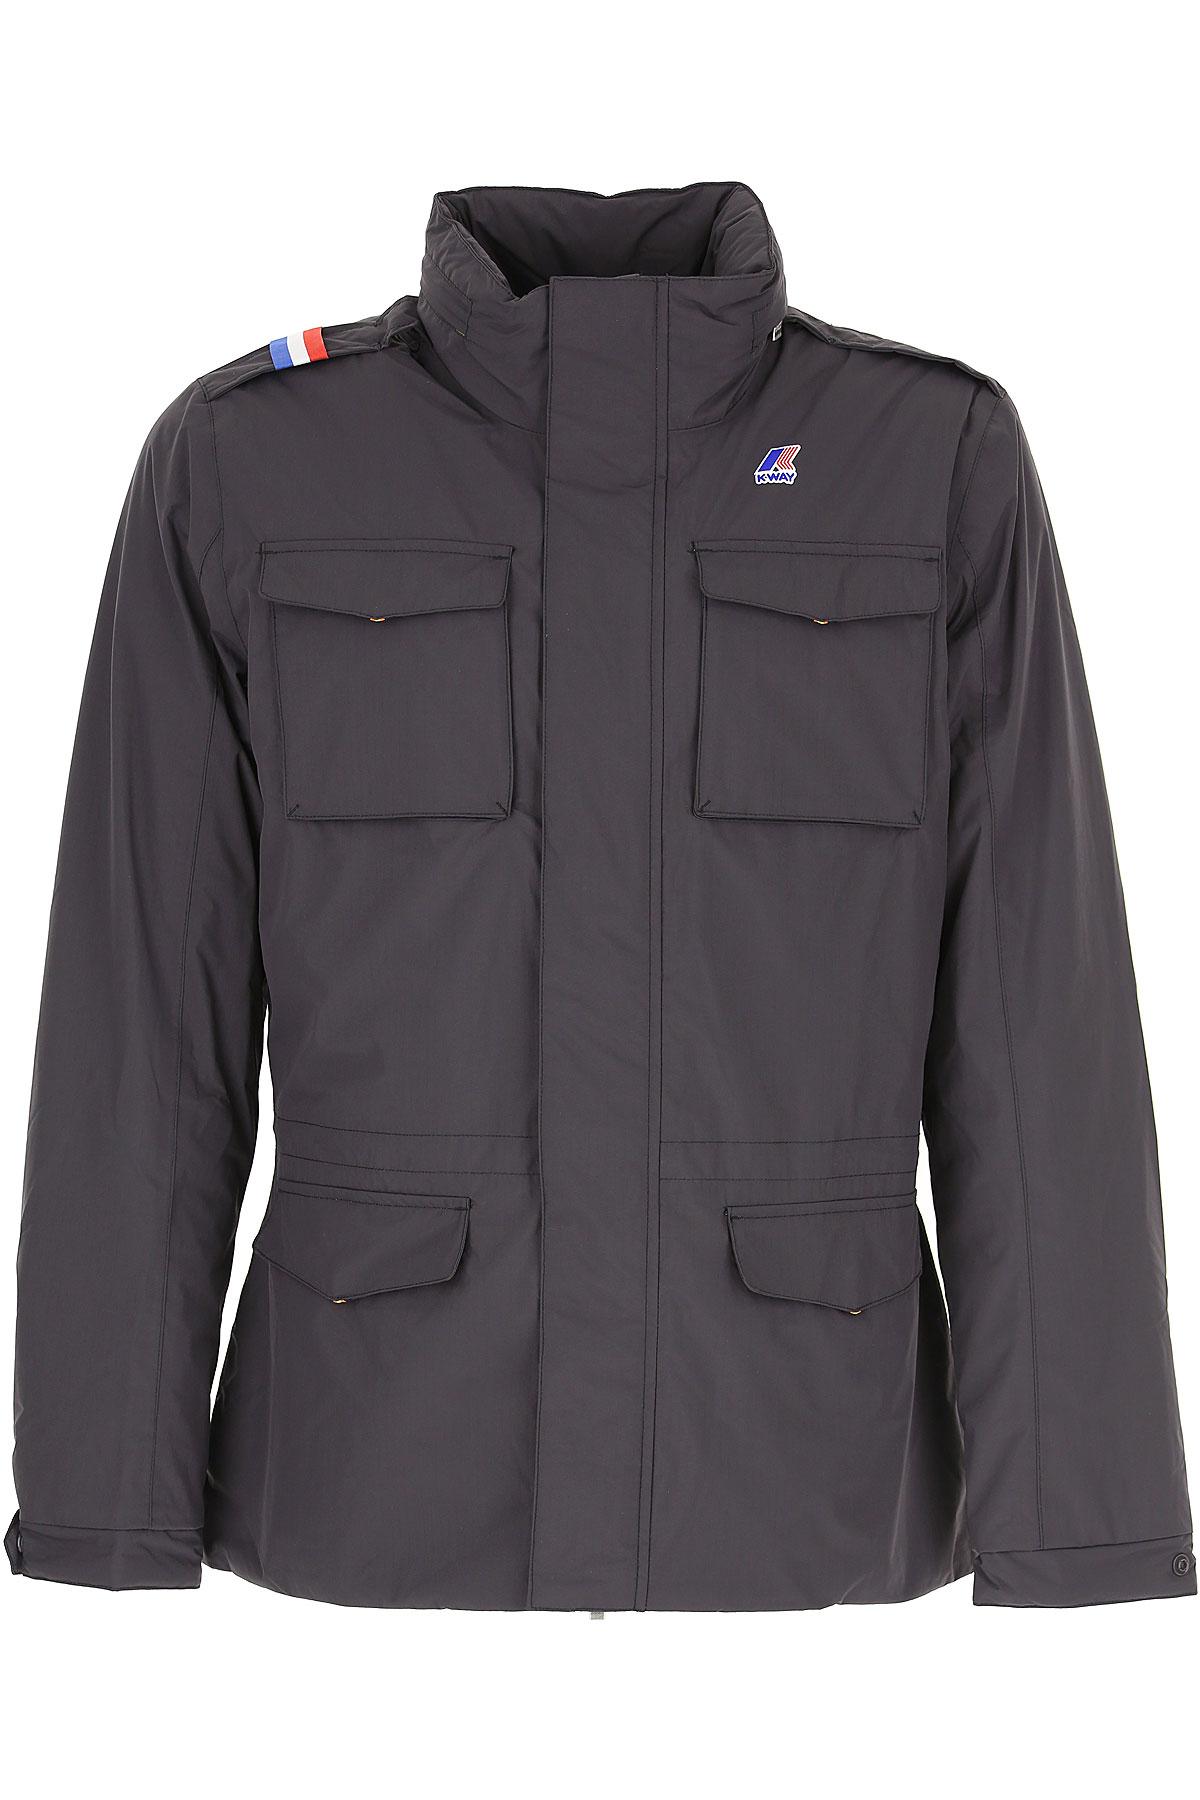 K-Way Down Jacket for Men, Puffer Ski Jacket On Sale, Anthracite, polyester, 2019, M XL